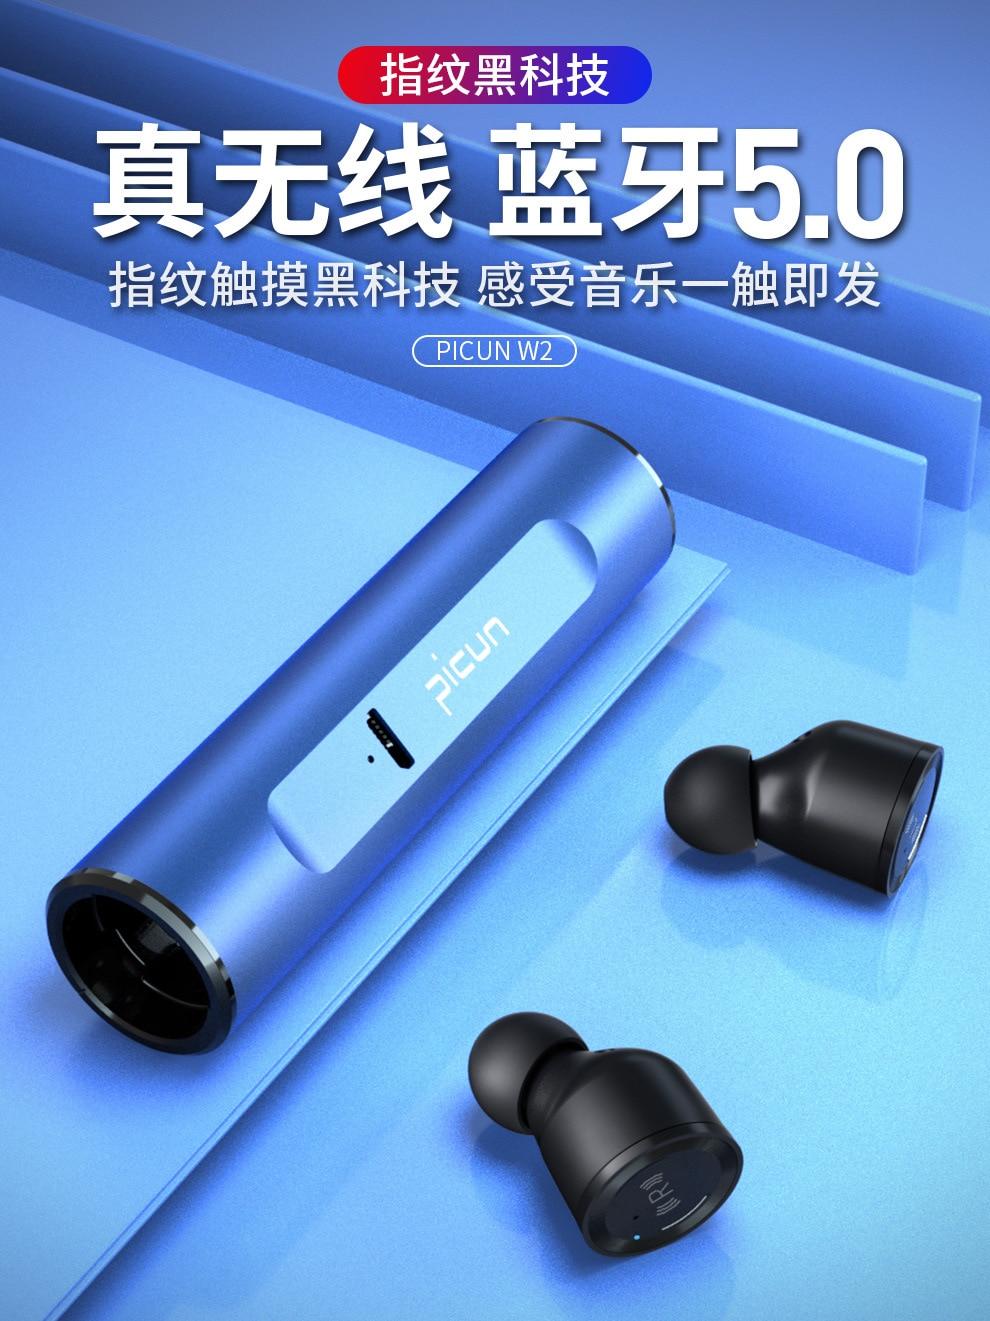 Picun W2 Wireless  Bluetooth Earphones Sports Bass Earphone Headset with Mic for iPhone Xiaomi Huawei PC MP3